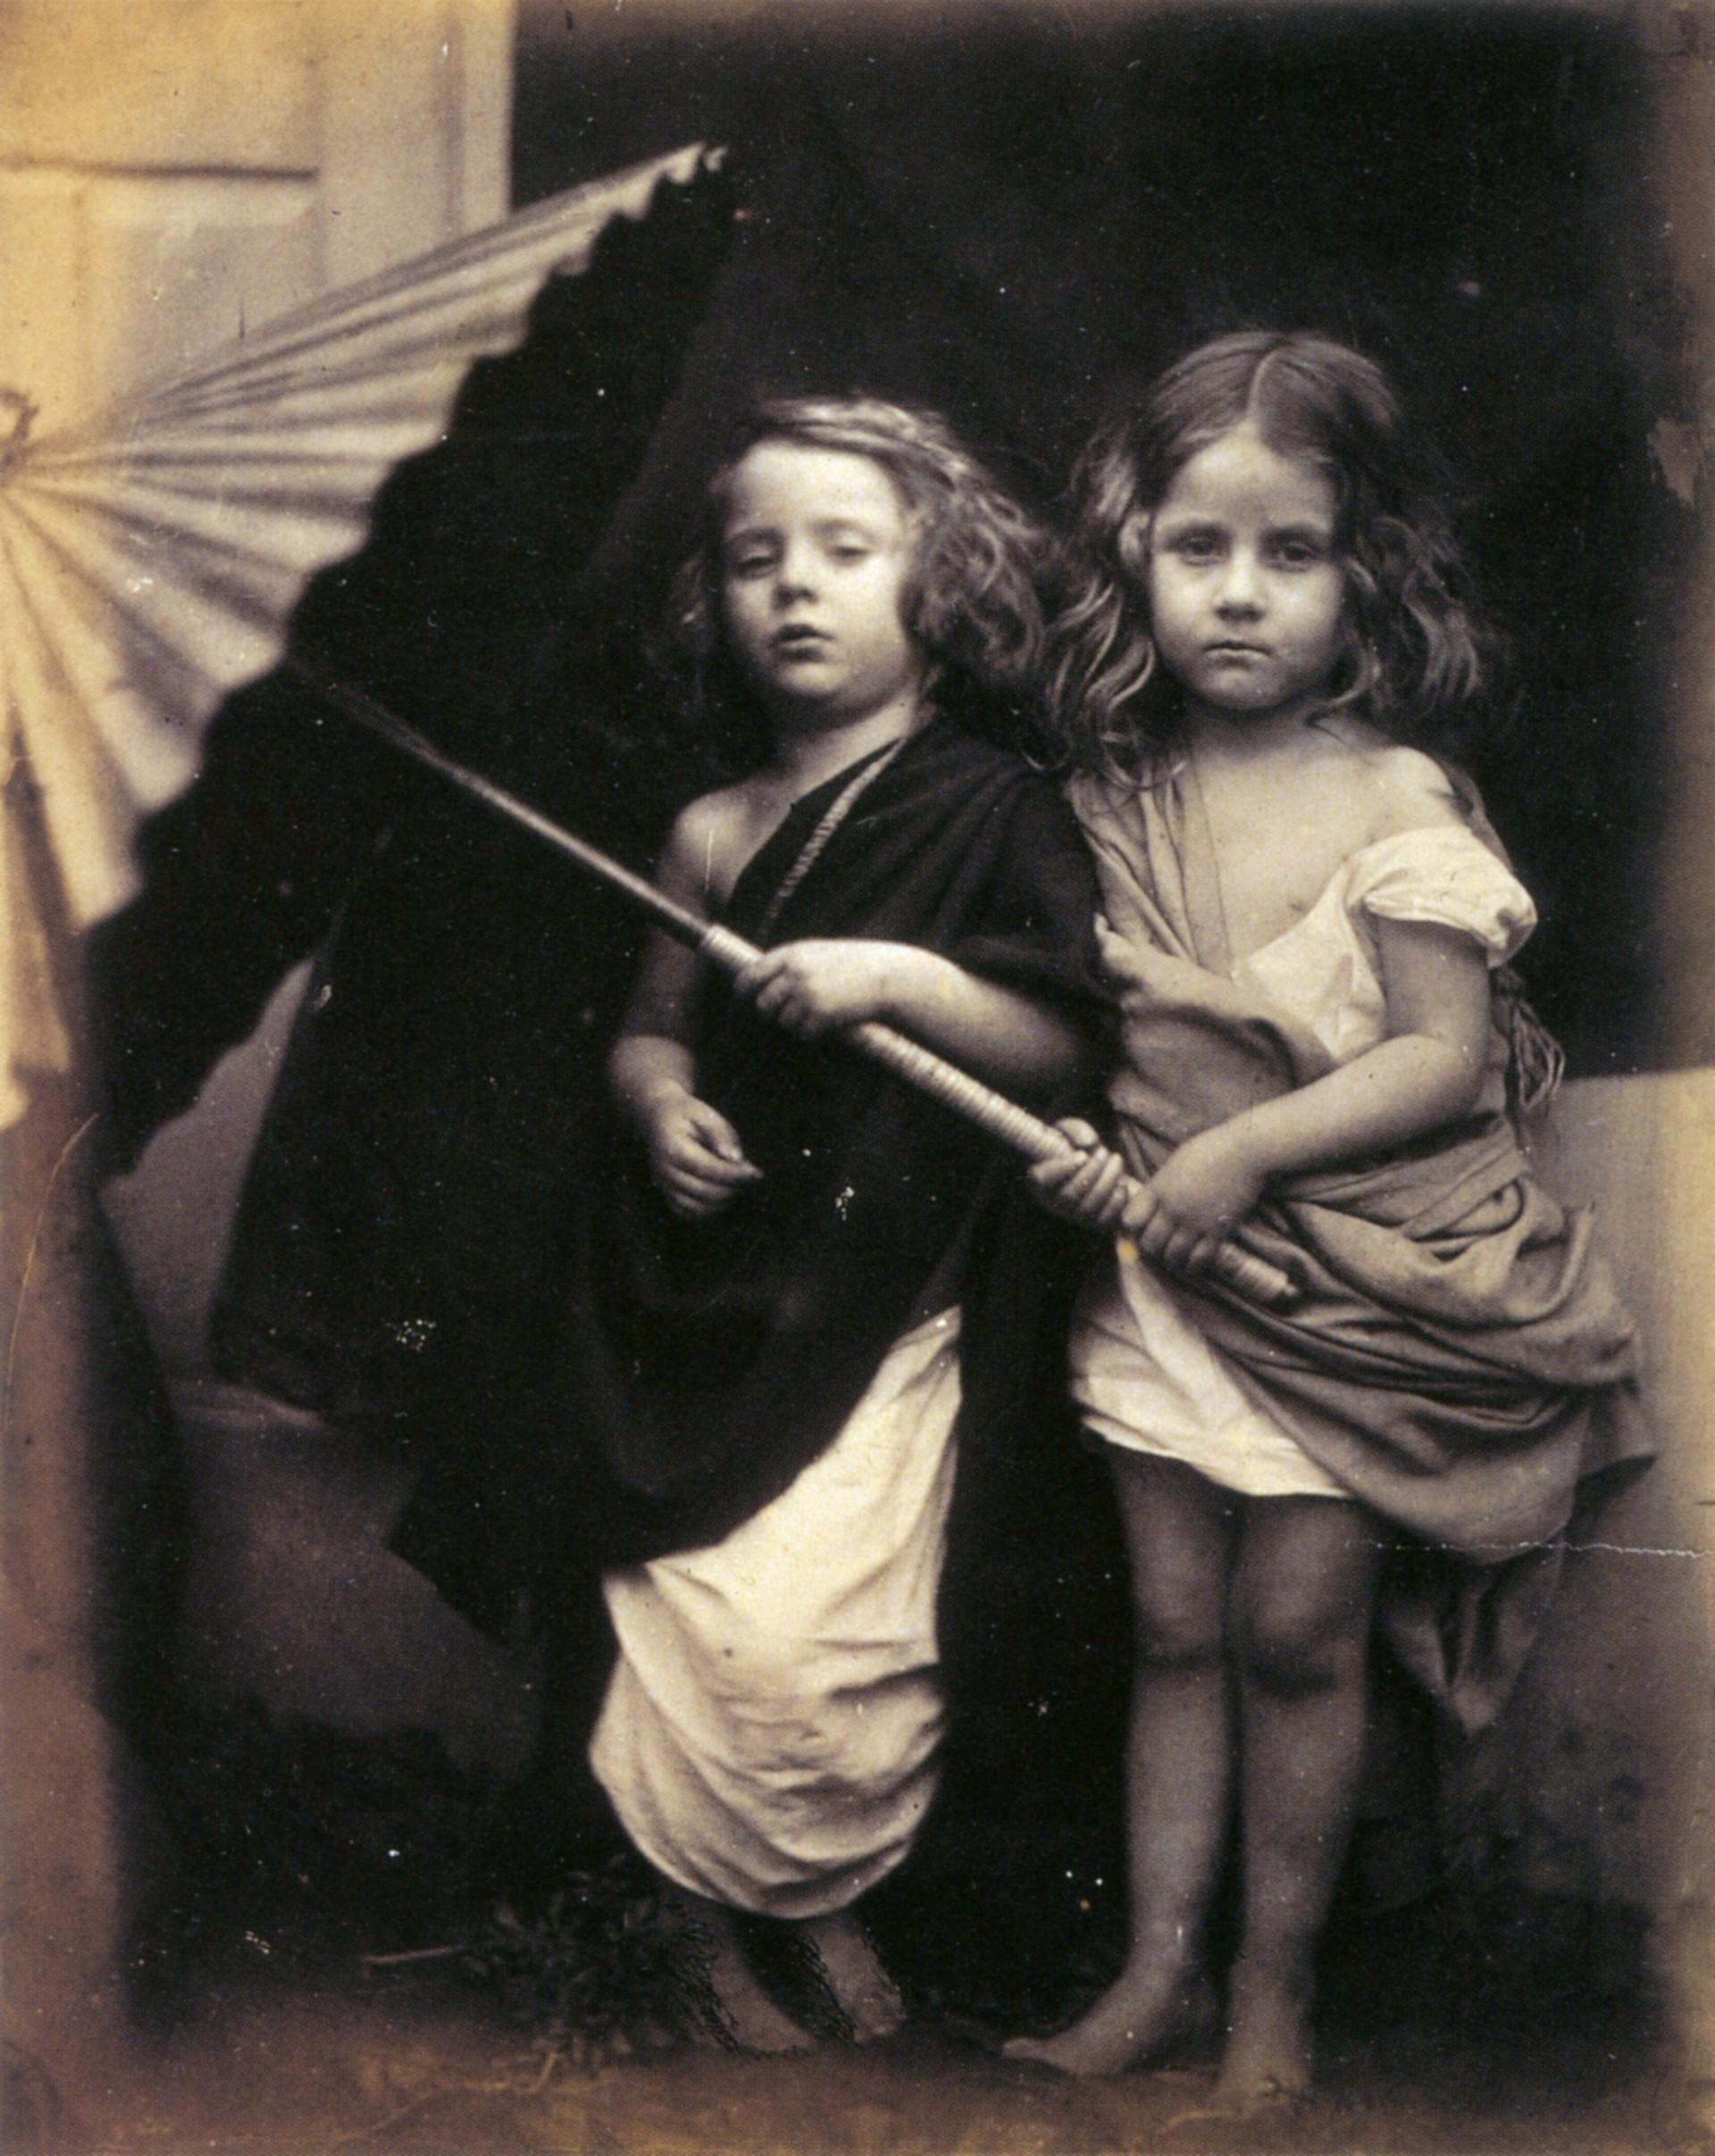 Пол и Вирджиния, 1864. Автор Джулия Маргарет Камерон